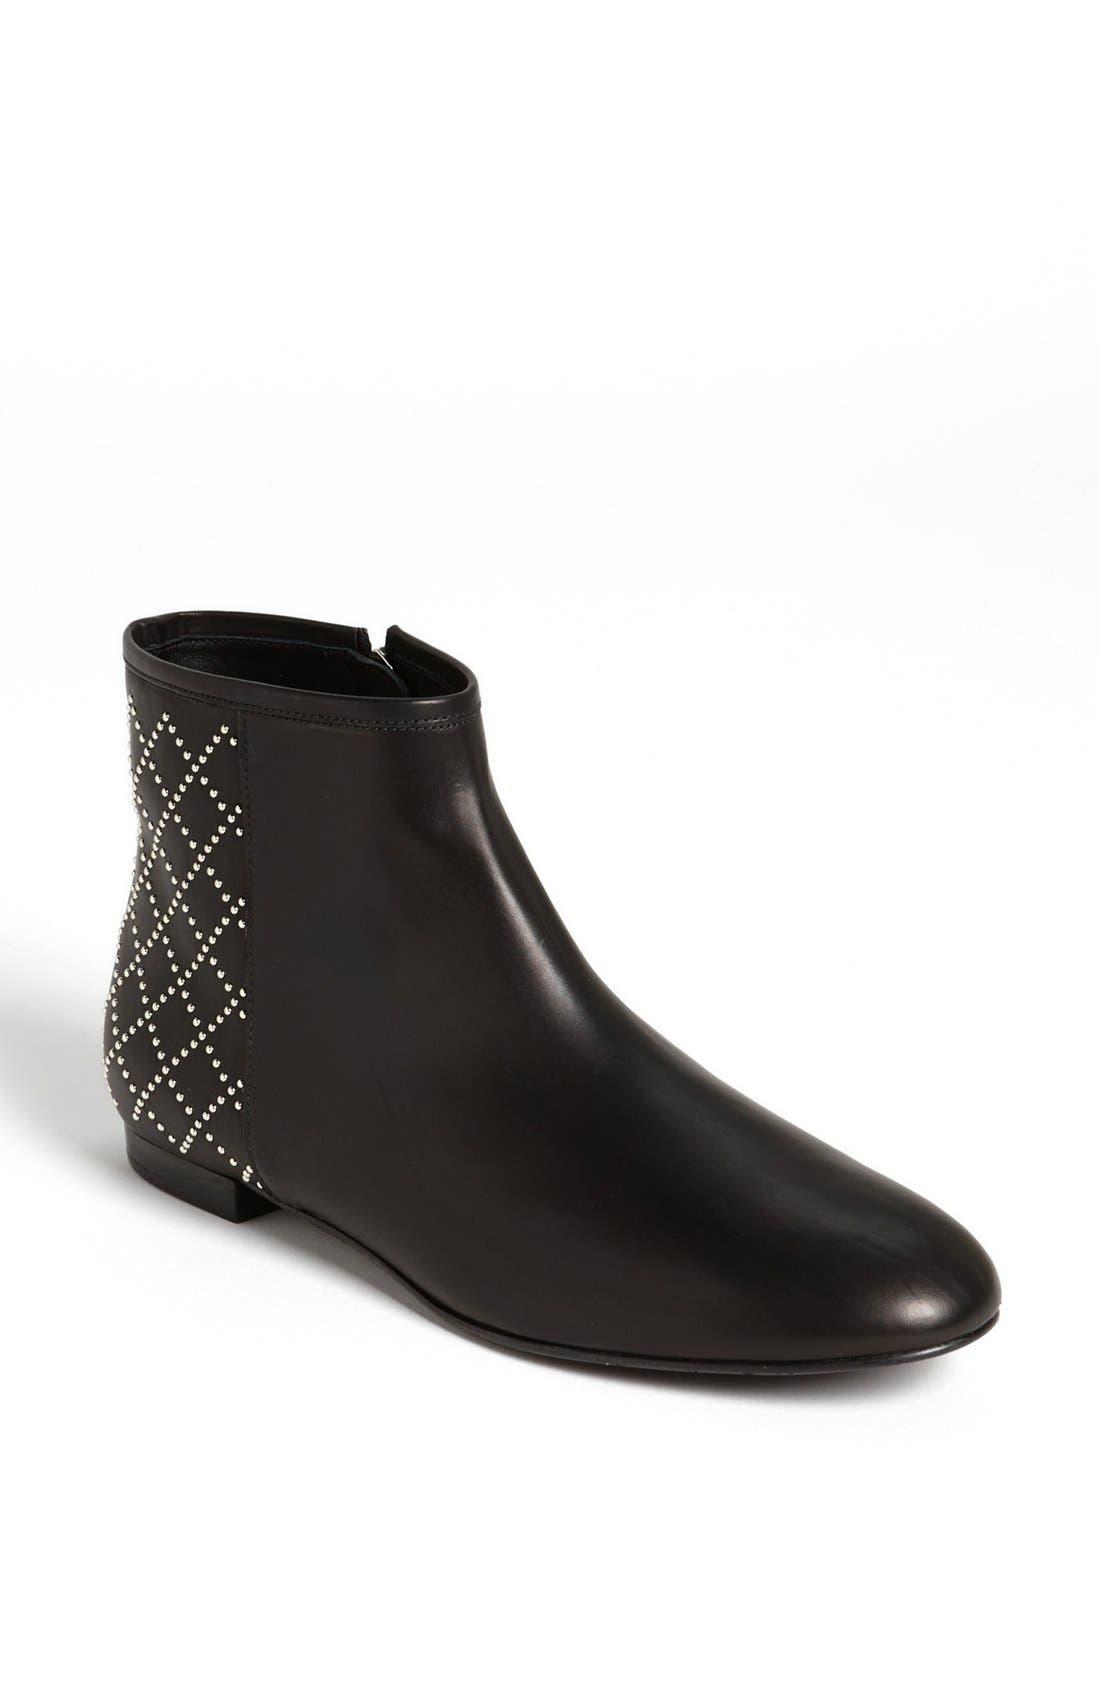 Alternate Image 1 Selected - Delman 'Milla' Boot